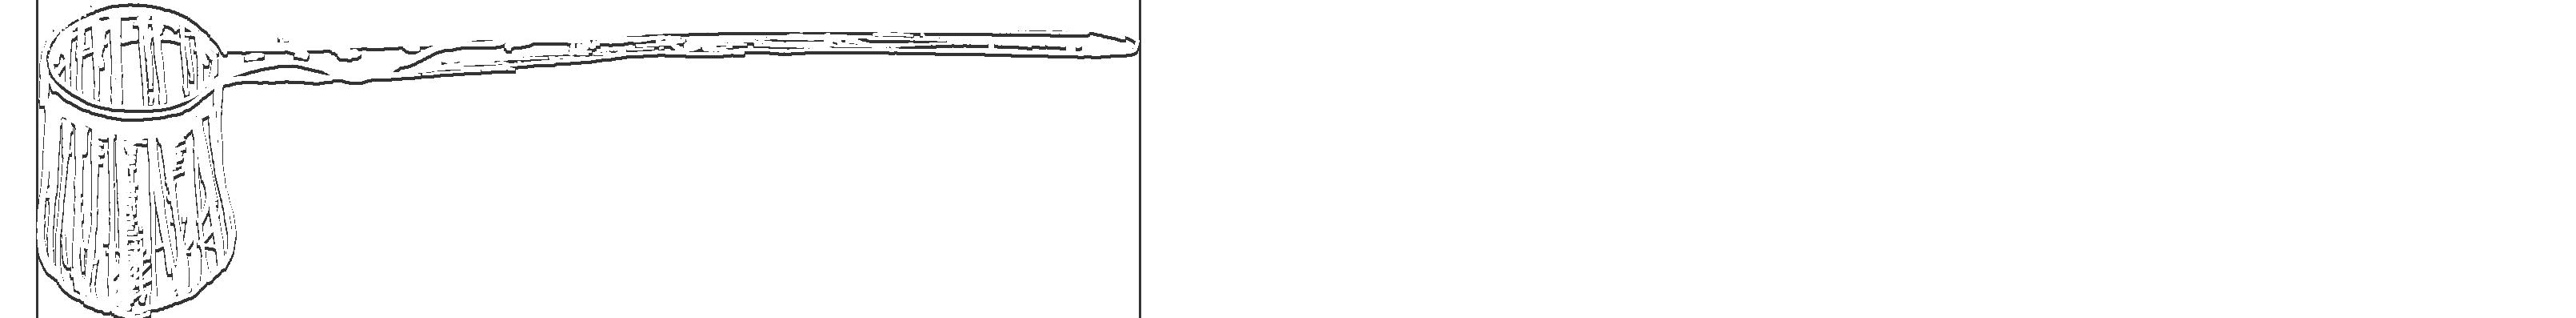 Historische vereniging